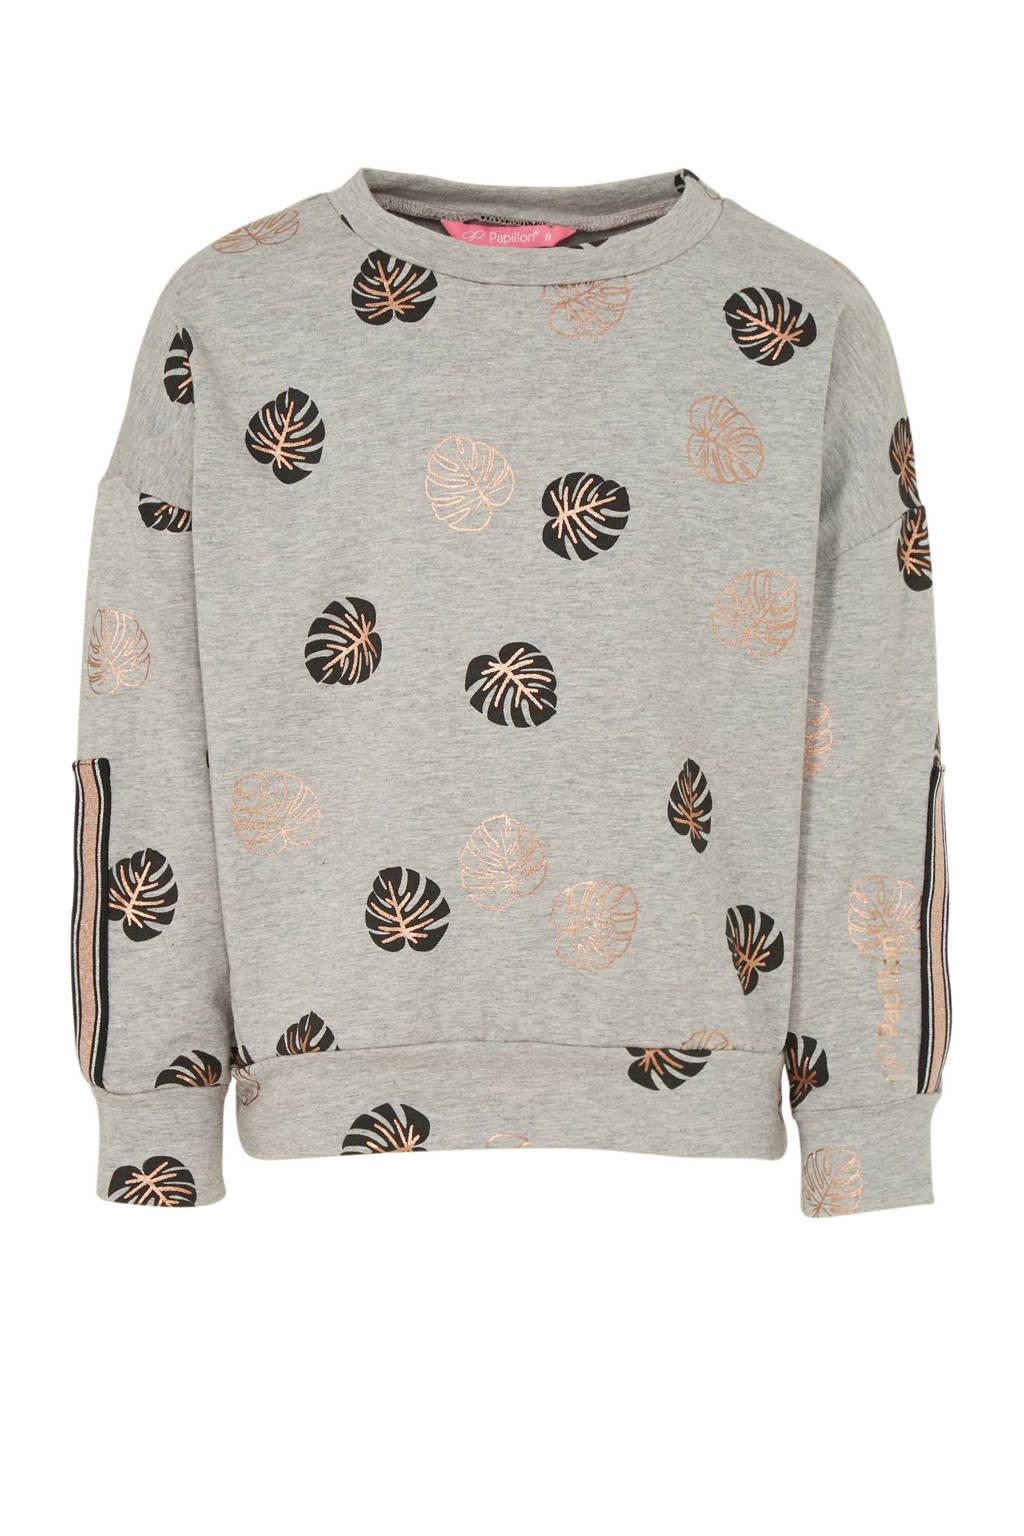 Papillon sportsweater blaadjes grijs/zwart/koper